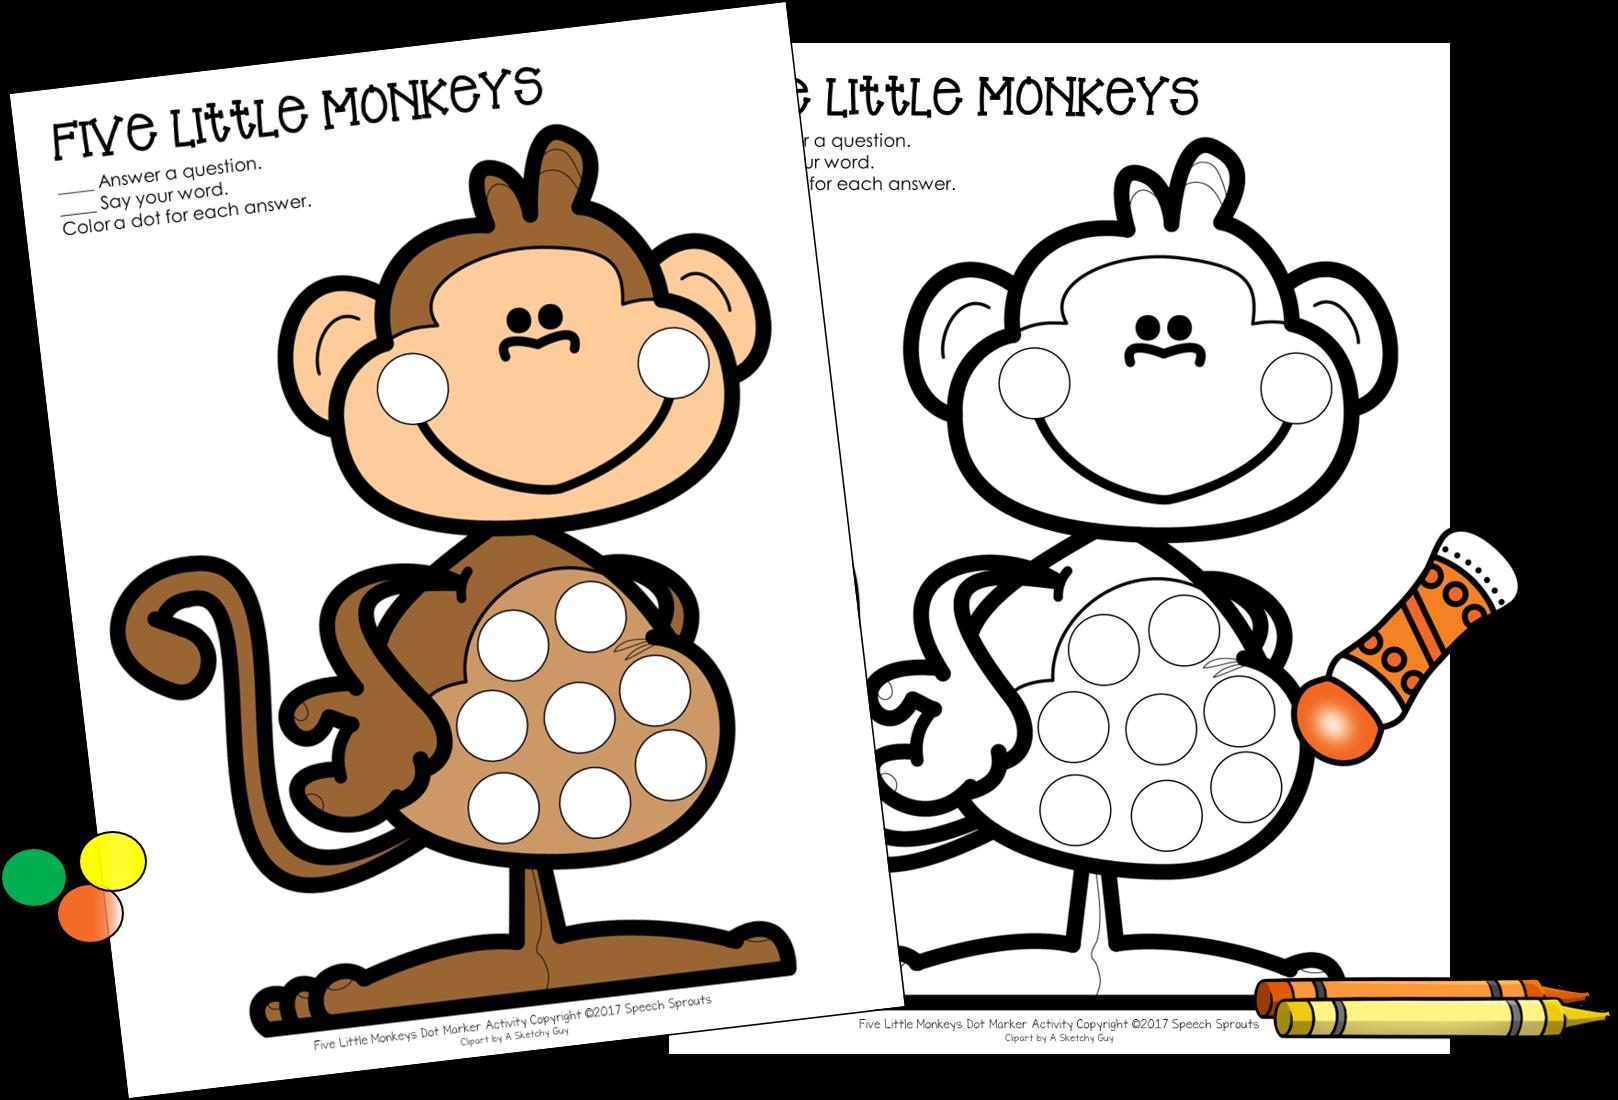 Clipart bed five little monkeys. Best ever books for